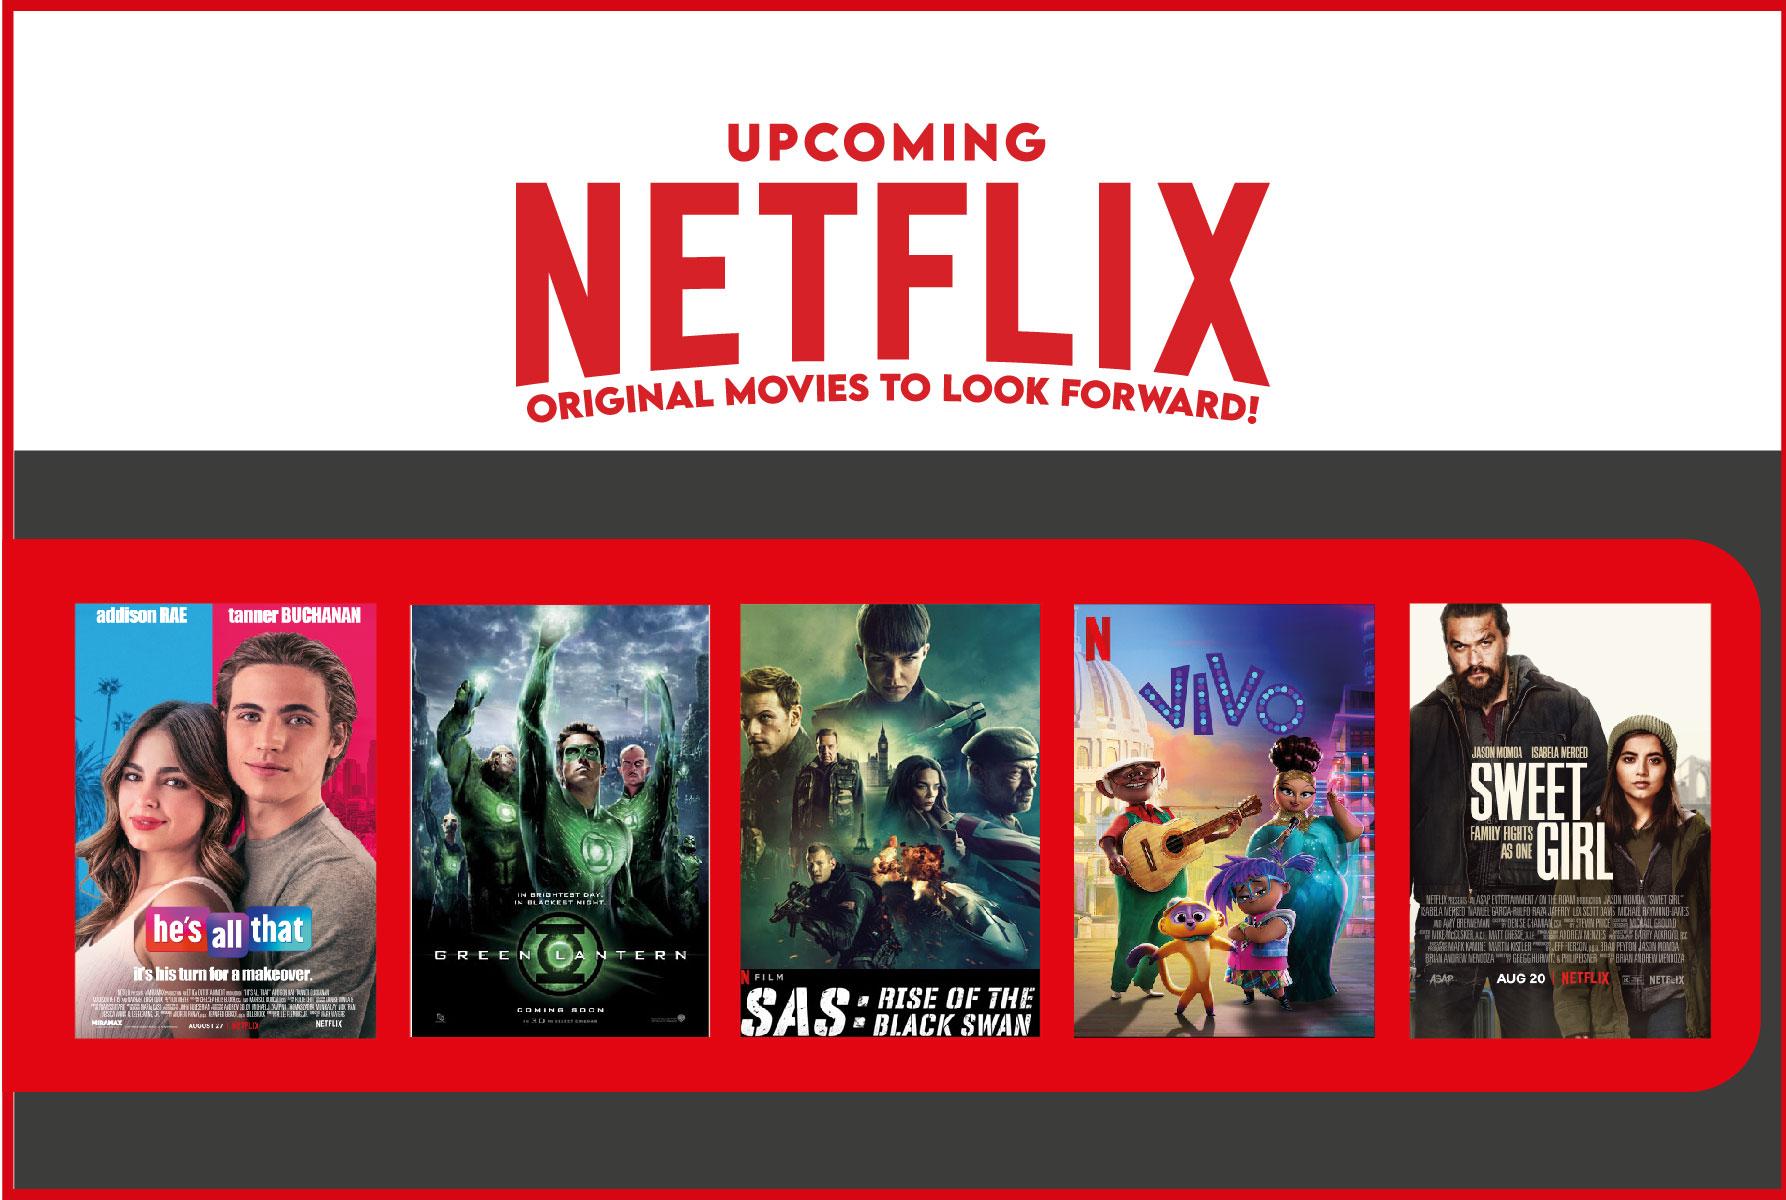 Upcoming Netflix Original Movies to Look Forward!